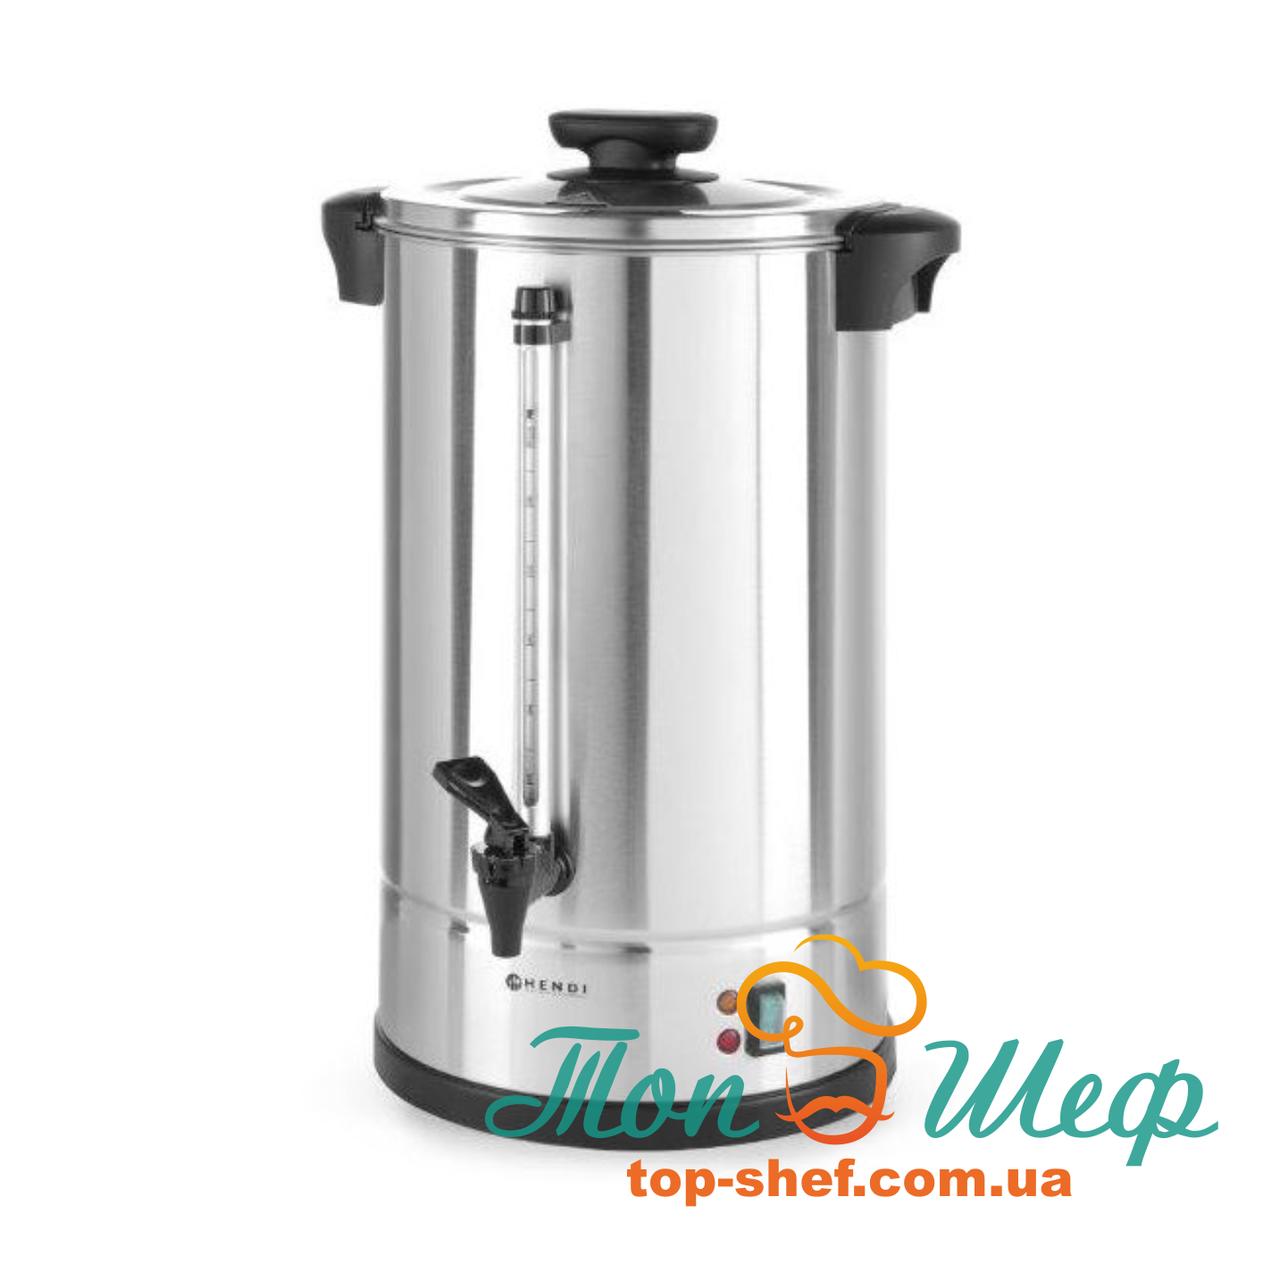 Кипятильник-кофеварка Hendi 211335 - 16л